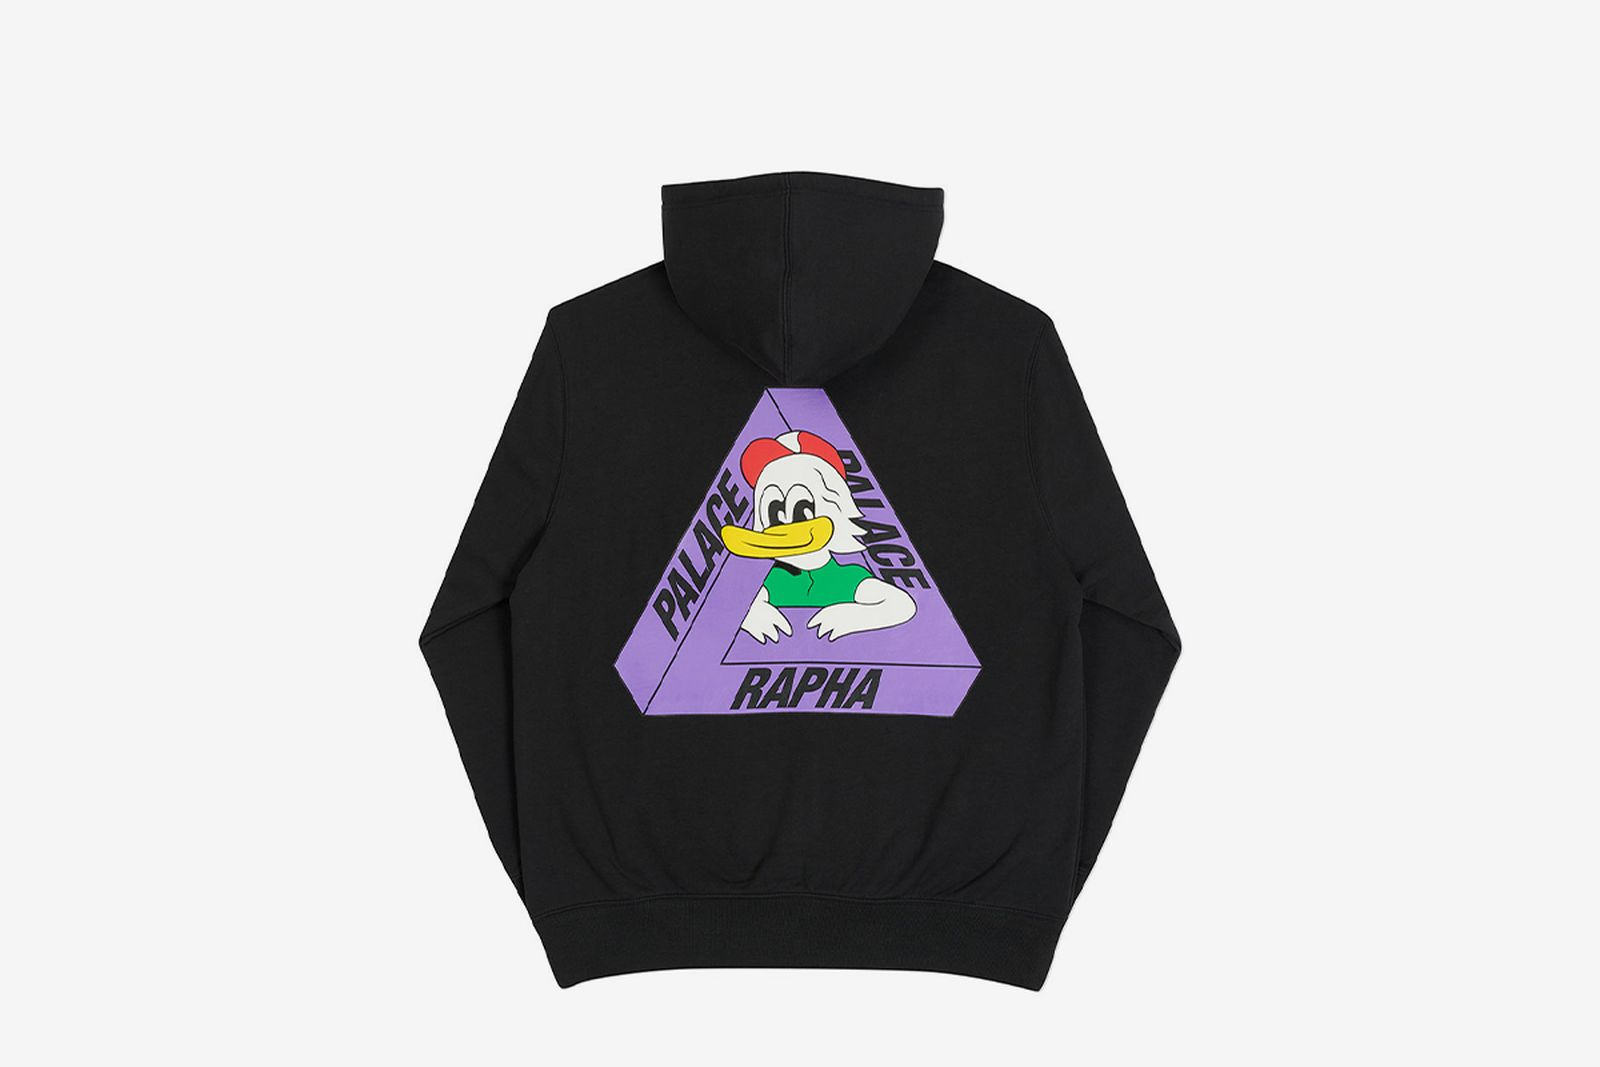 palace-rapha-products-14